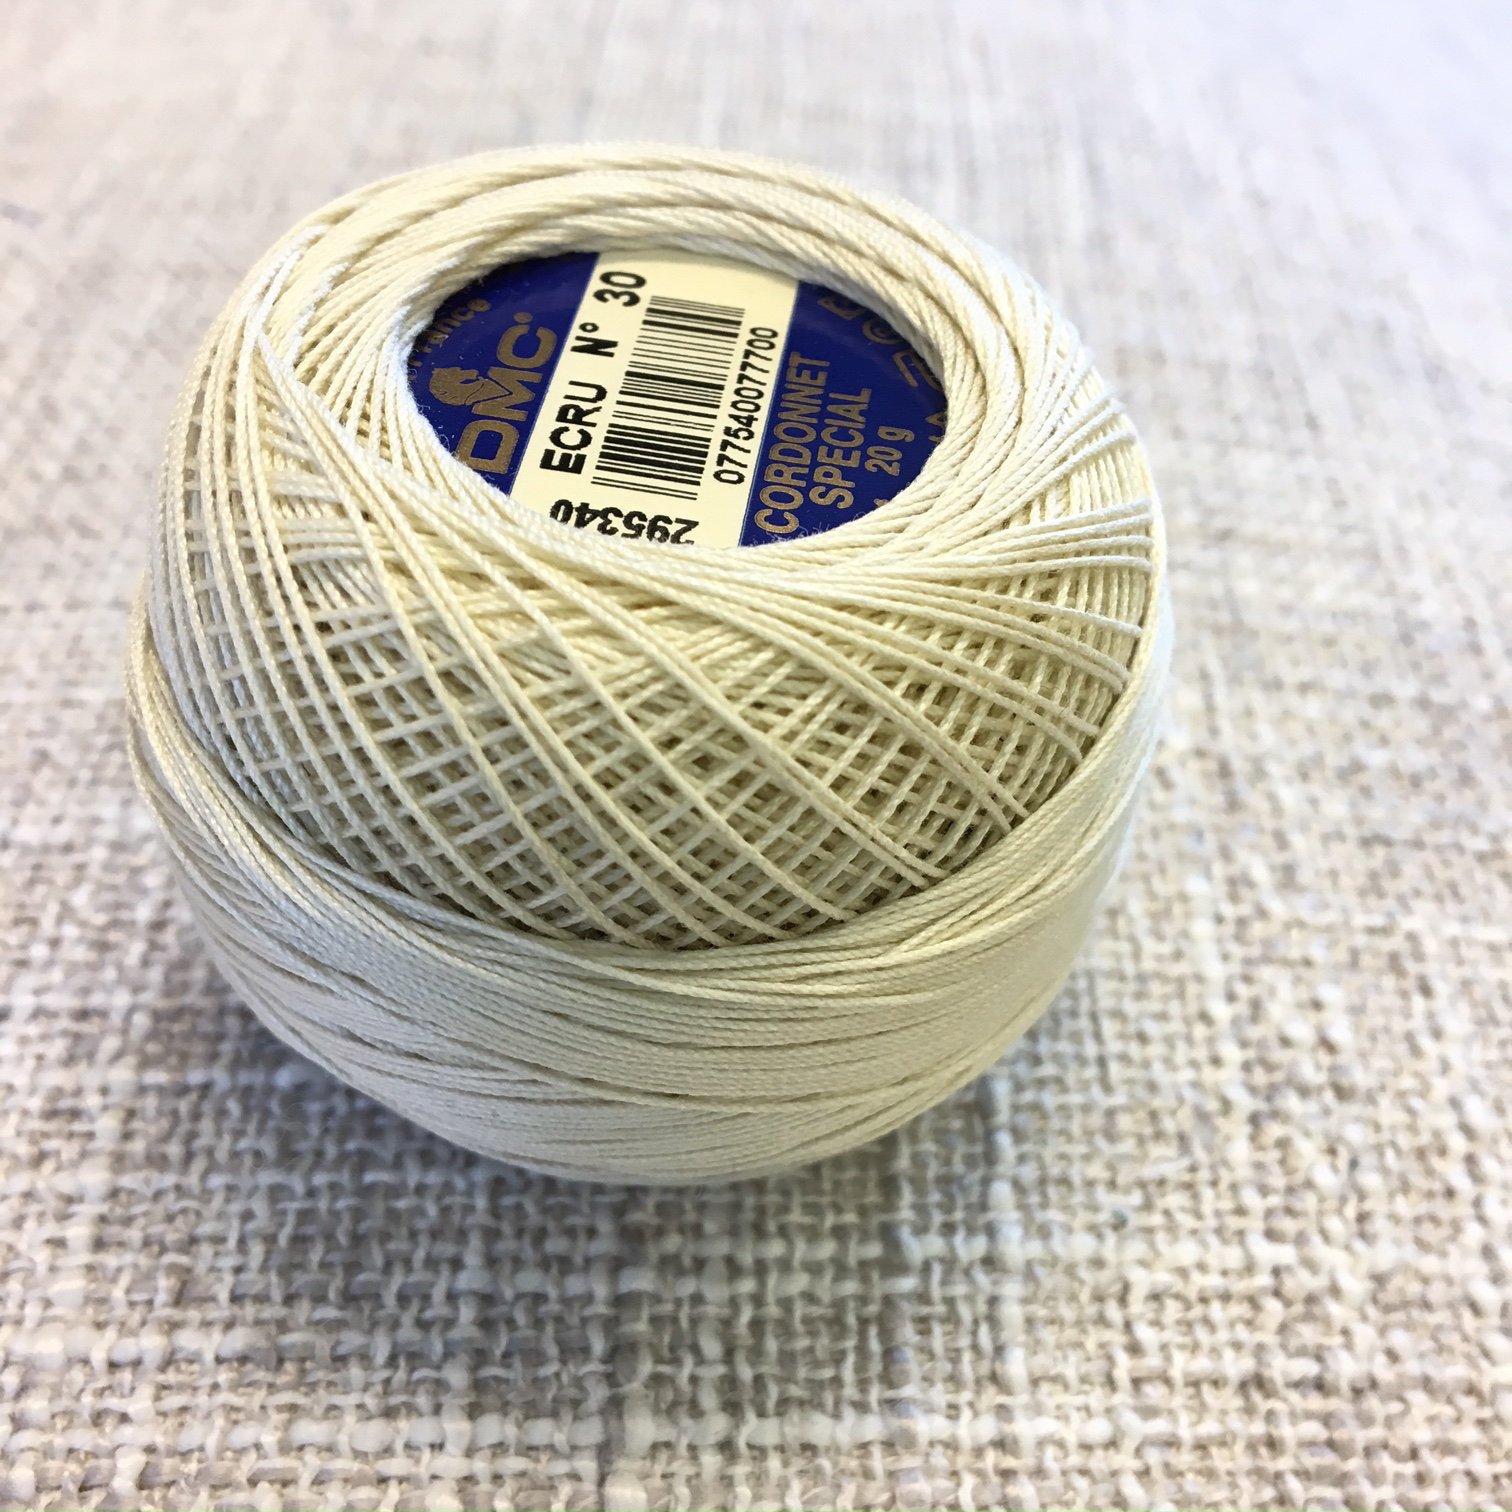 Crochet Cotton #30 - Ecru